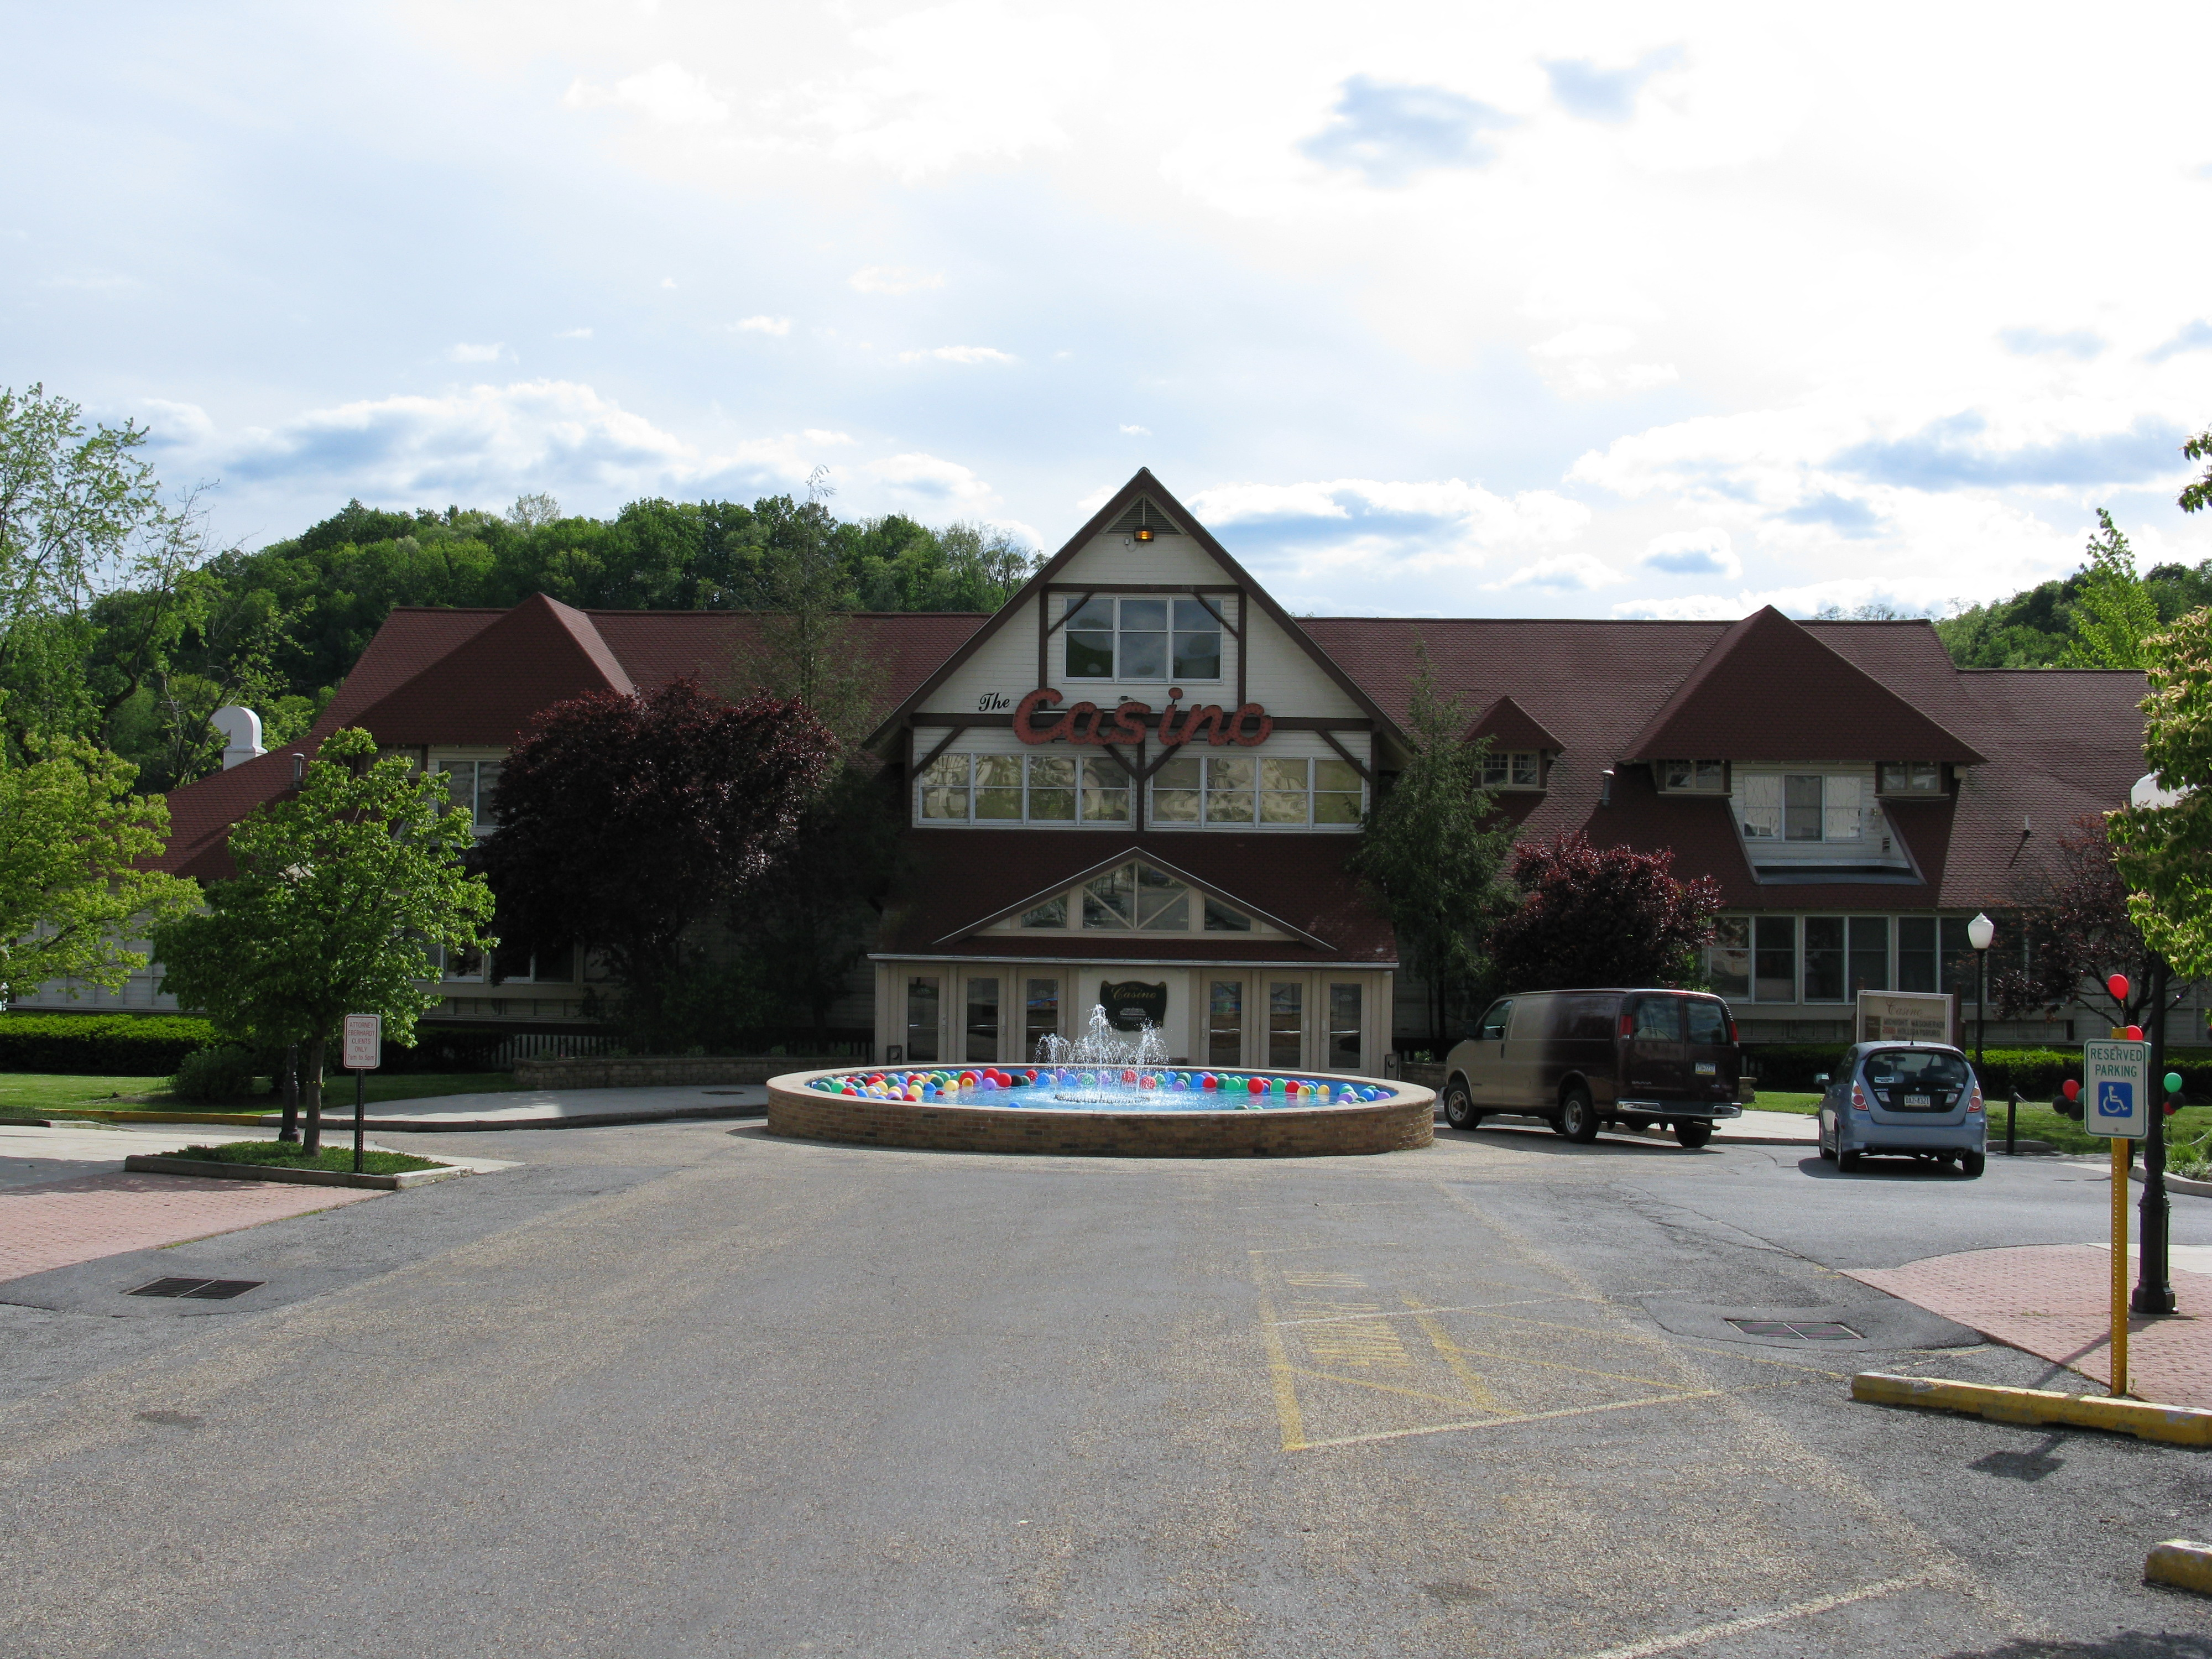 The casino lakemont william hill gambling addiction